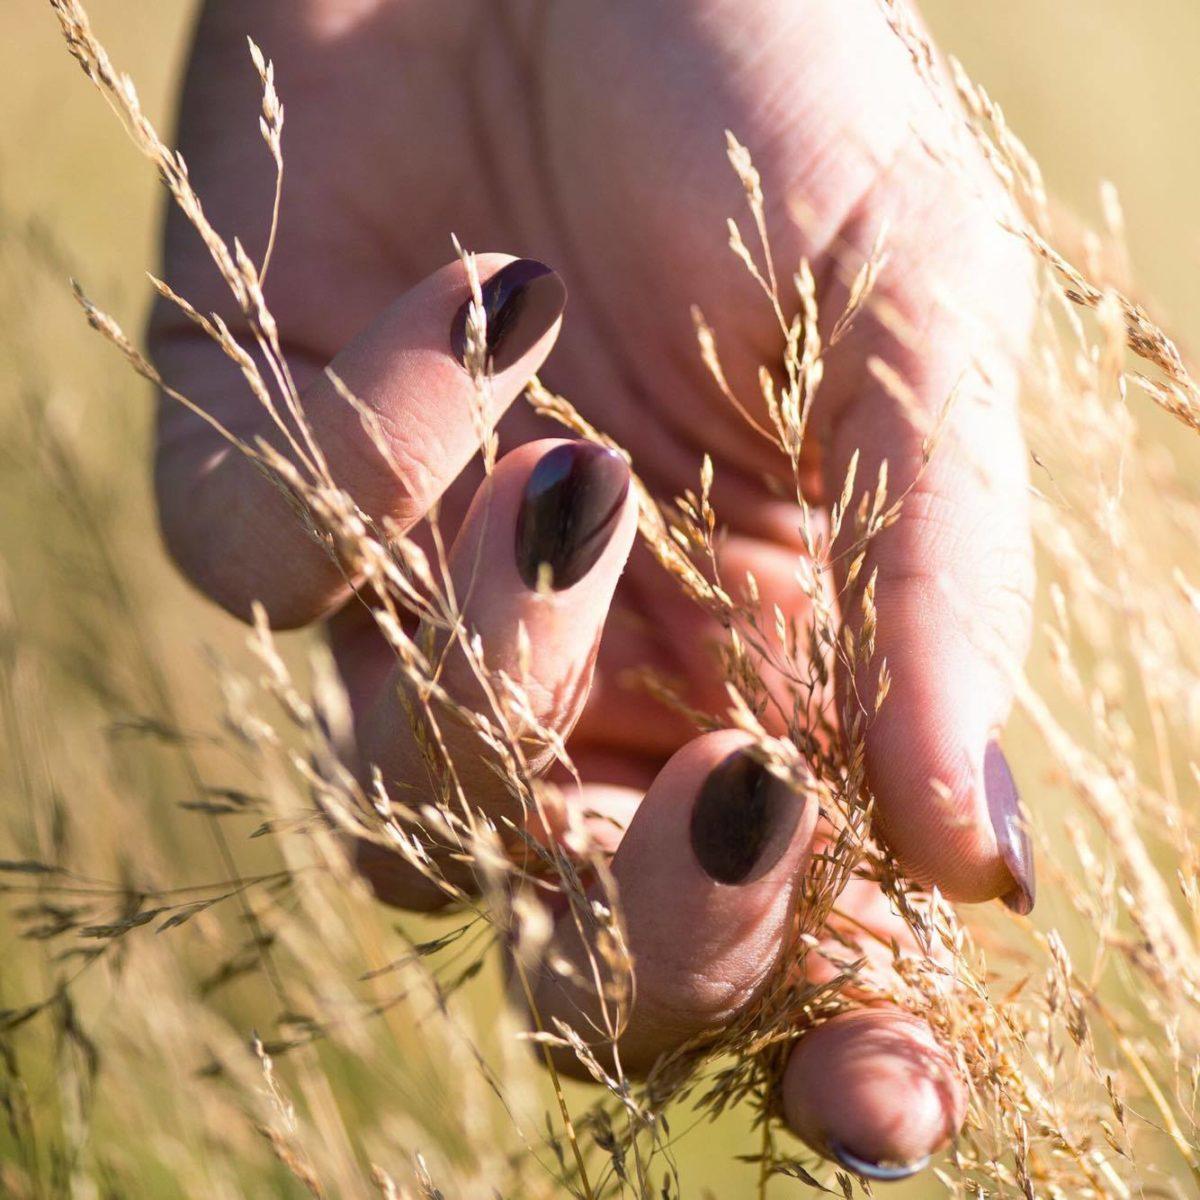 Kako pravilom ishranom do njegovanih stopala, ruku i noktiju?